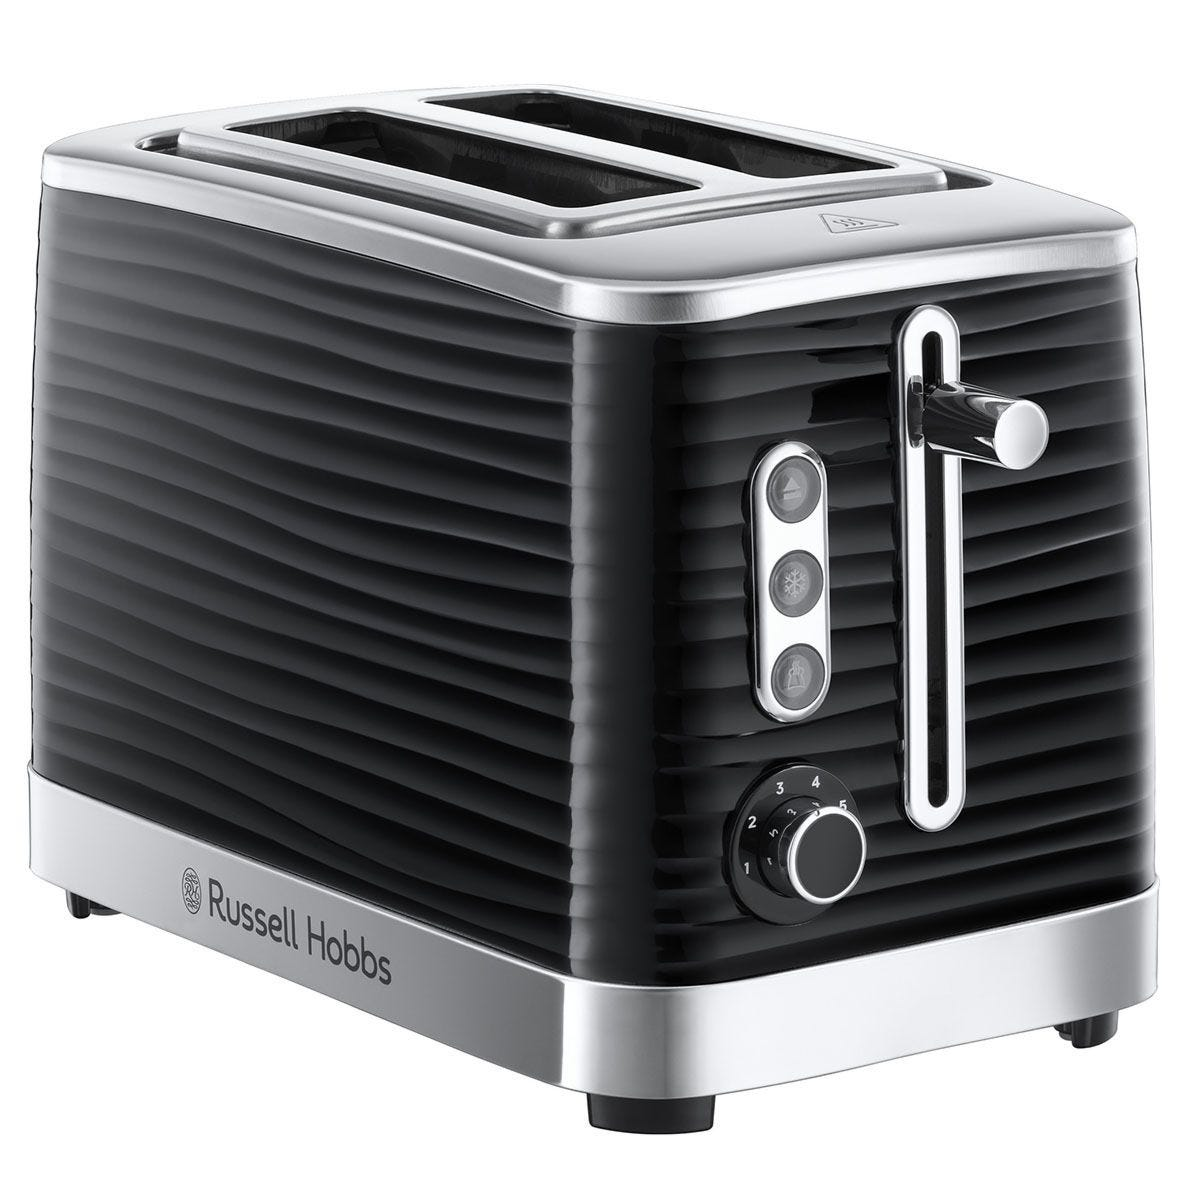 Russell Hobbs Inspire 2-Slice Toaster - Black